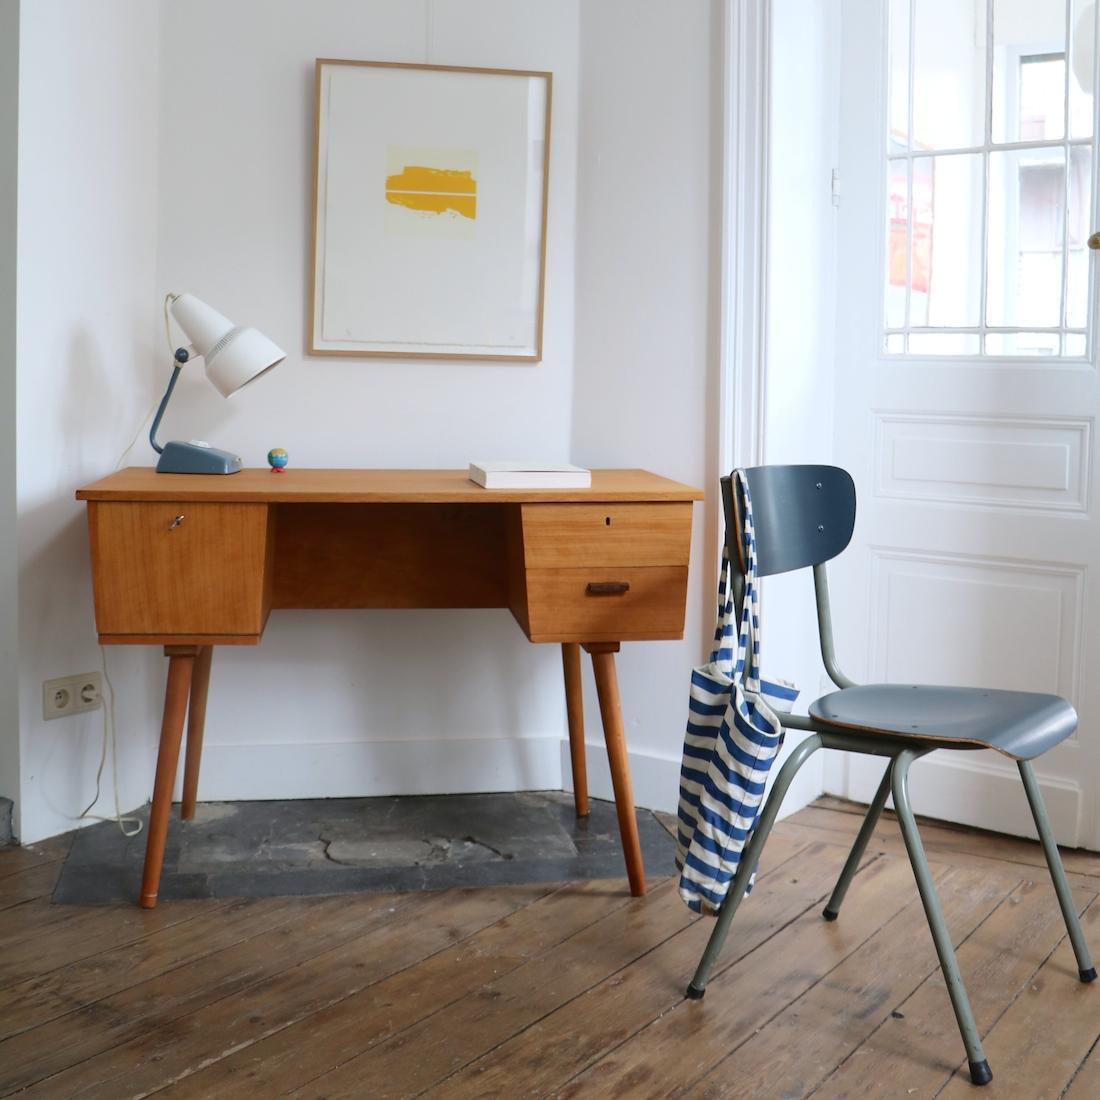 bureau recto verso 50 la maison bruxelloise. Black Bedroom Furniture Sets. Home Design Ideas